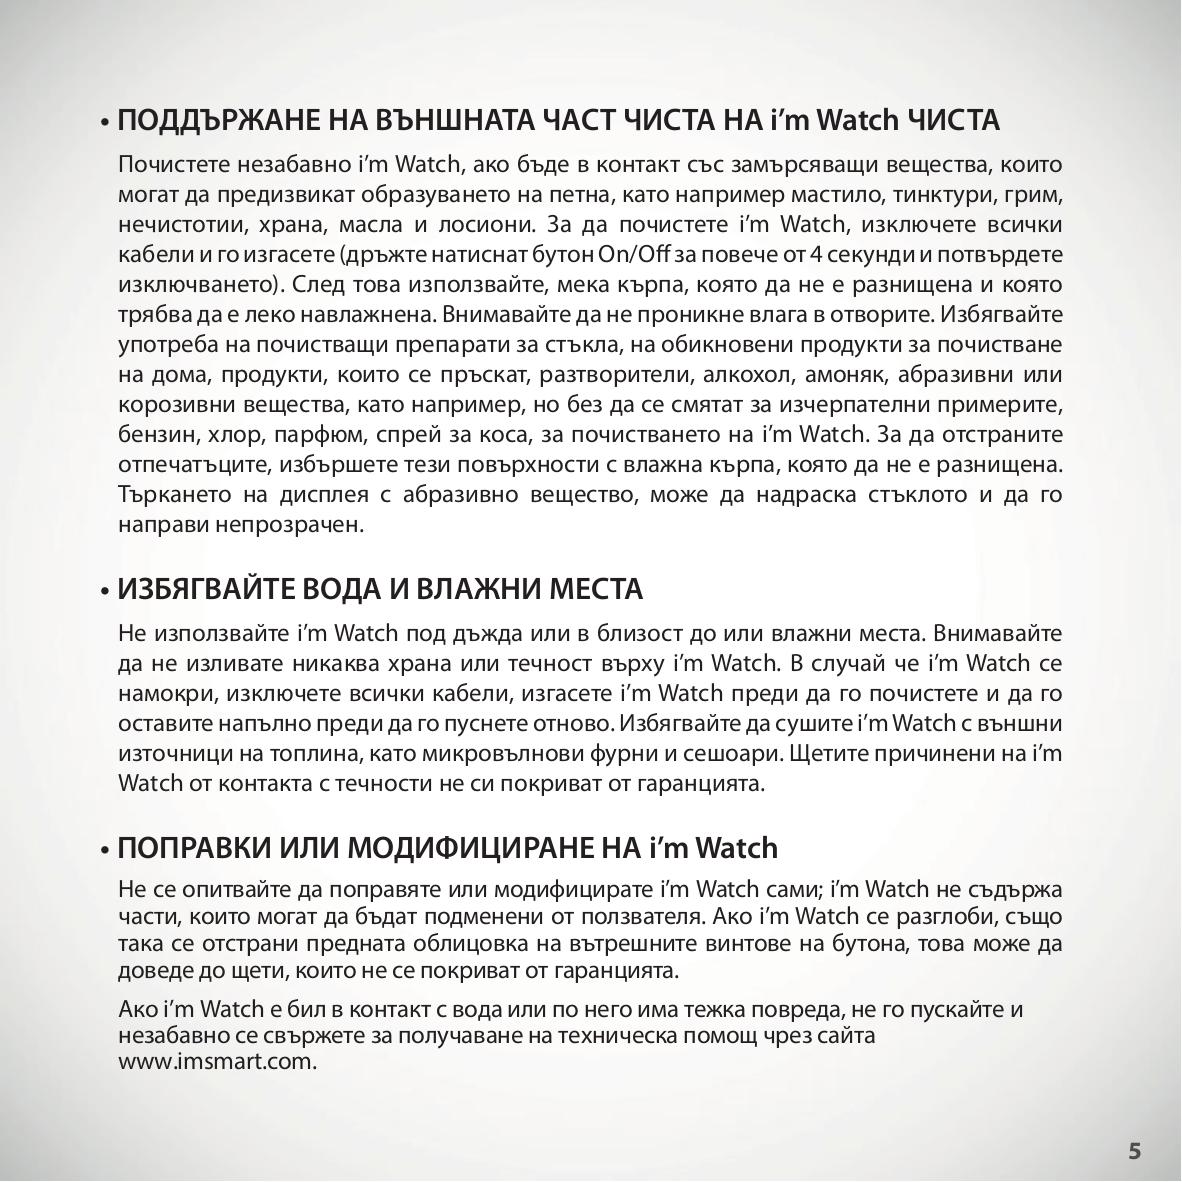 pdf manual for pulsar watch pf3527 rh umlib com Pulsar Watches Men Pulsar Digital Watch